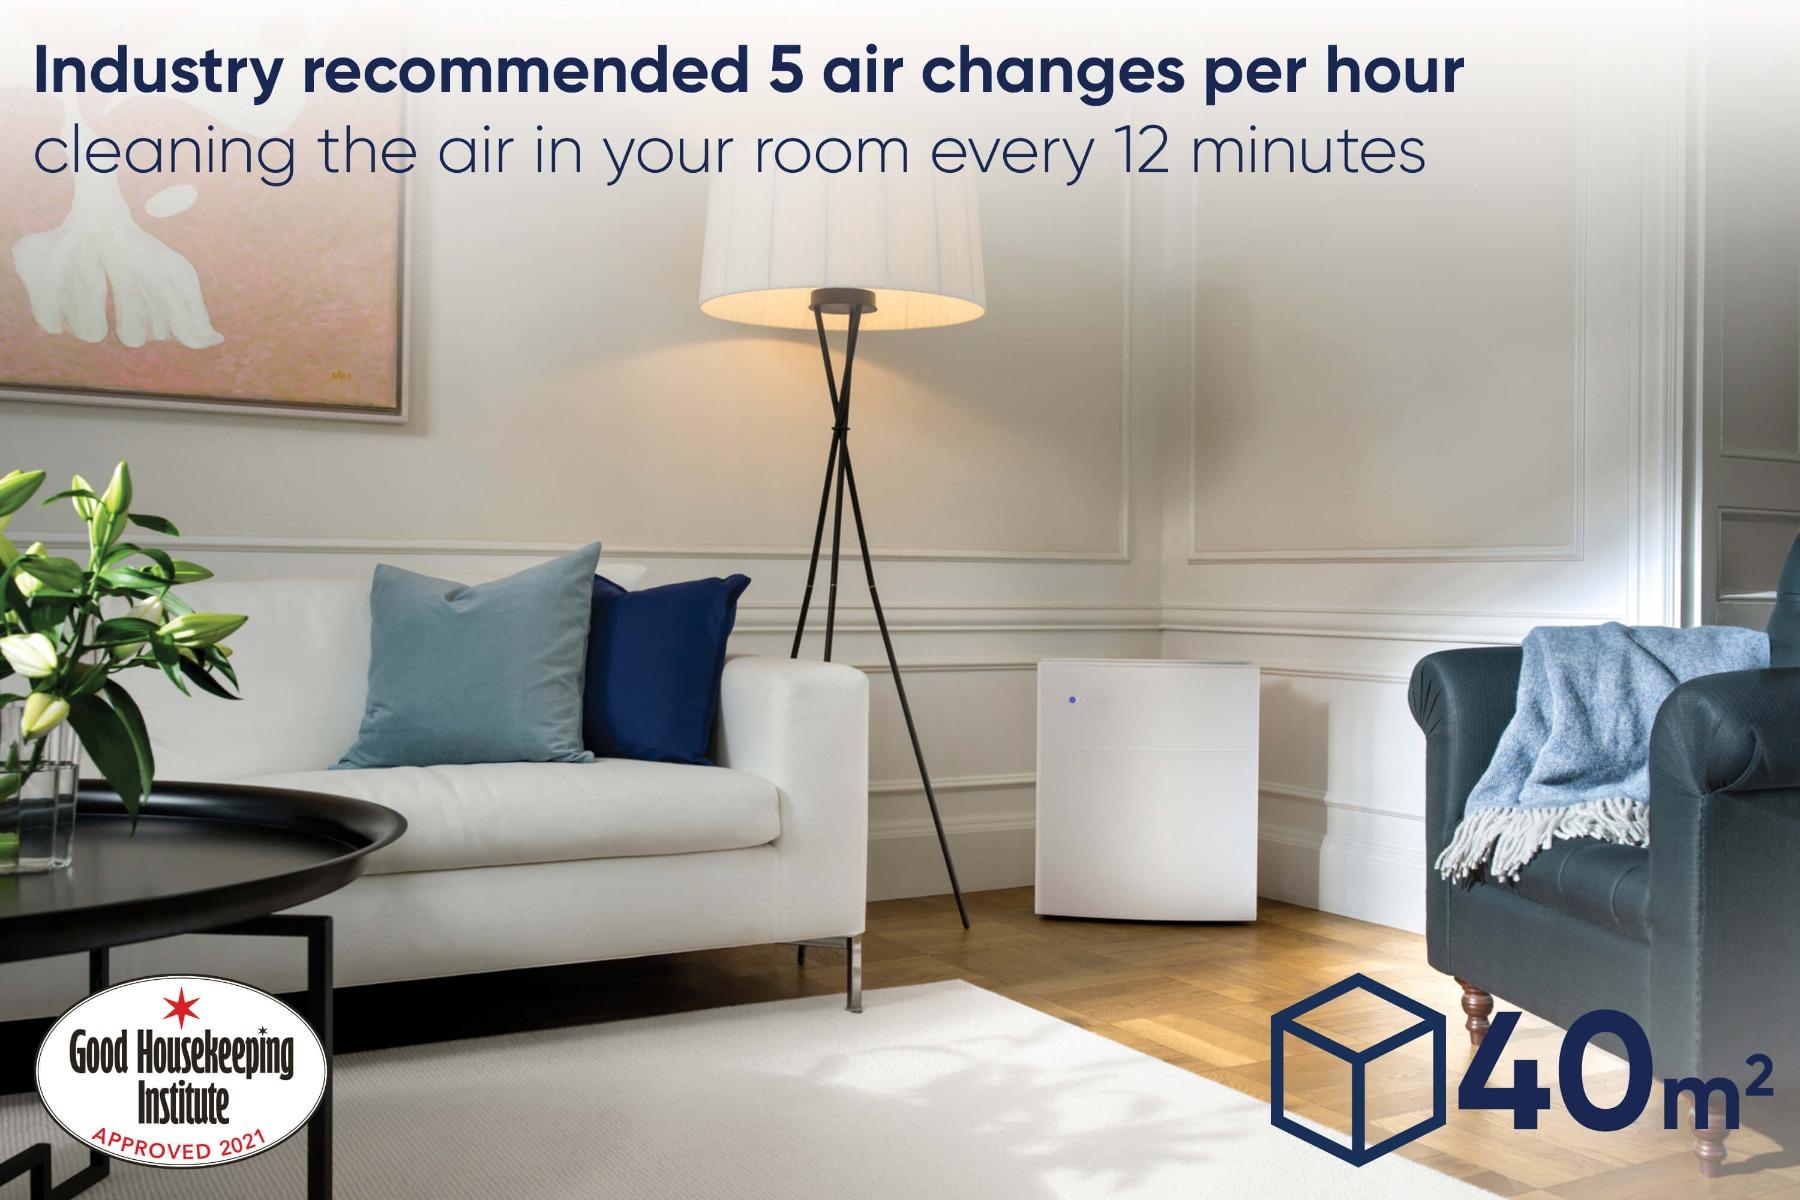 Blueair Classic 405 Air Purifier filter changes